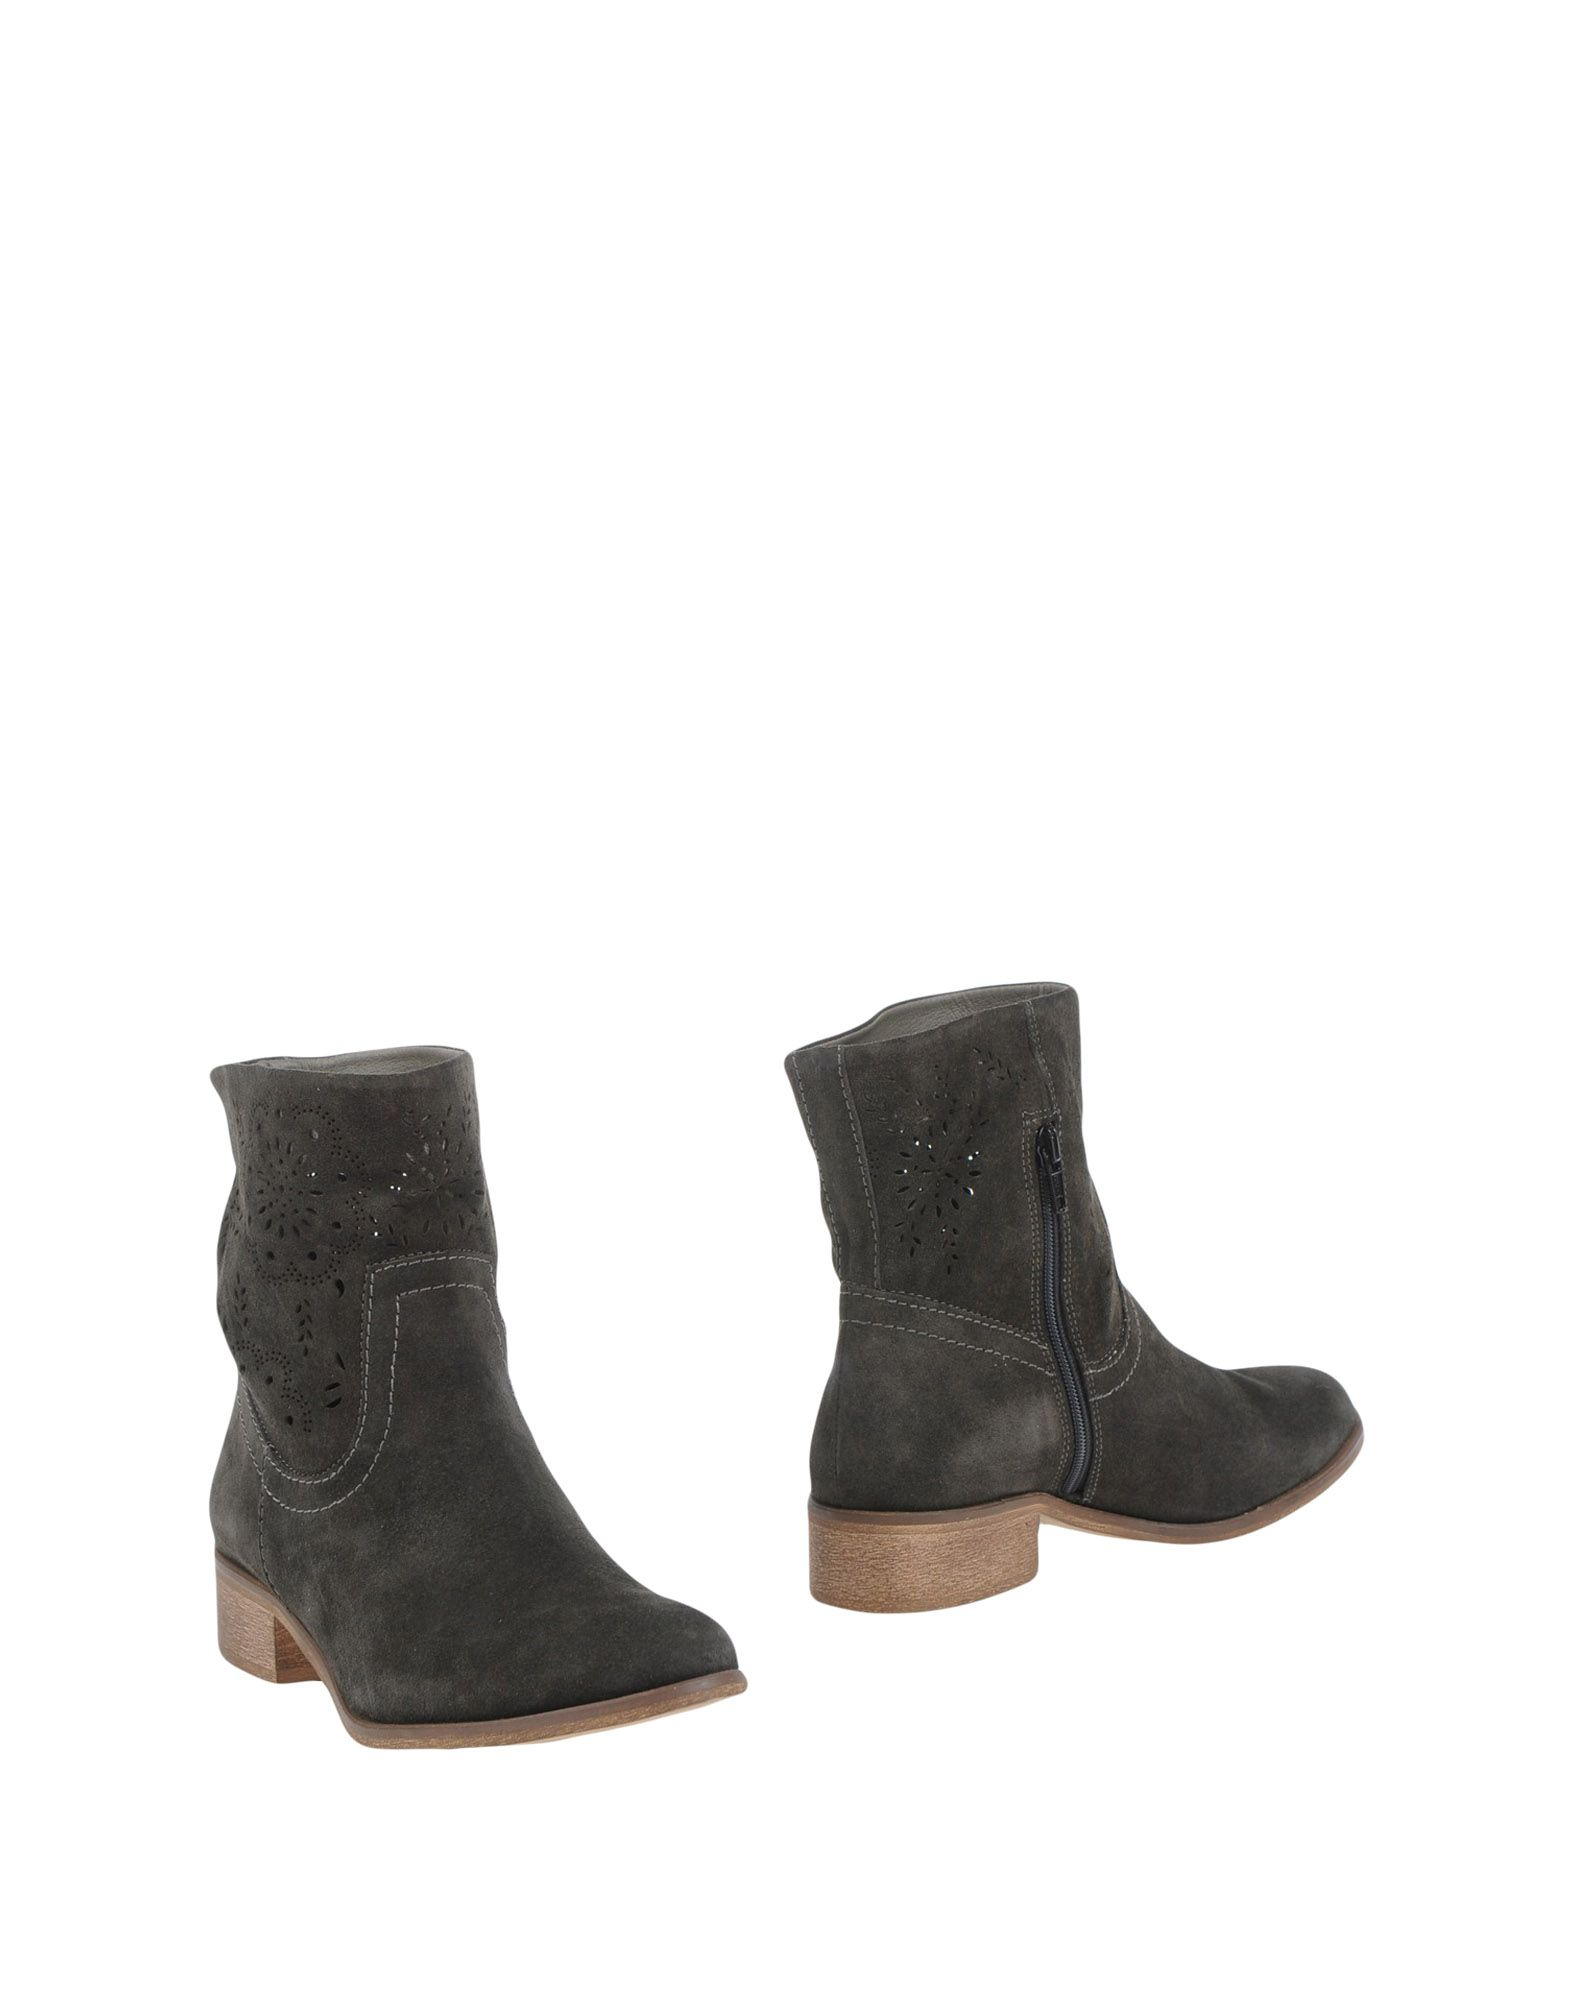 GIORGIO PICINO Полусапоги и высокие ботинки ankle boots giorgio picino ботильоны на толстом каблуке